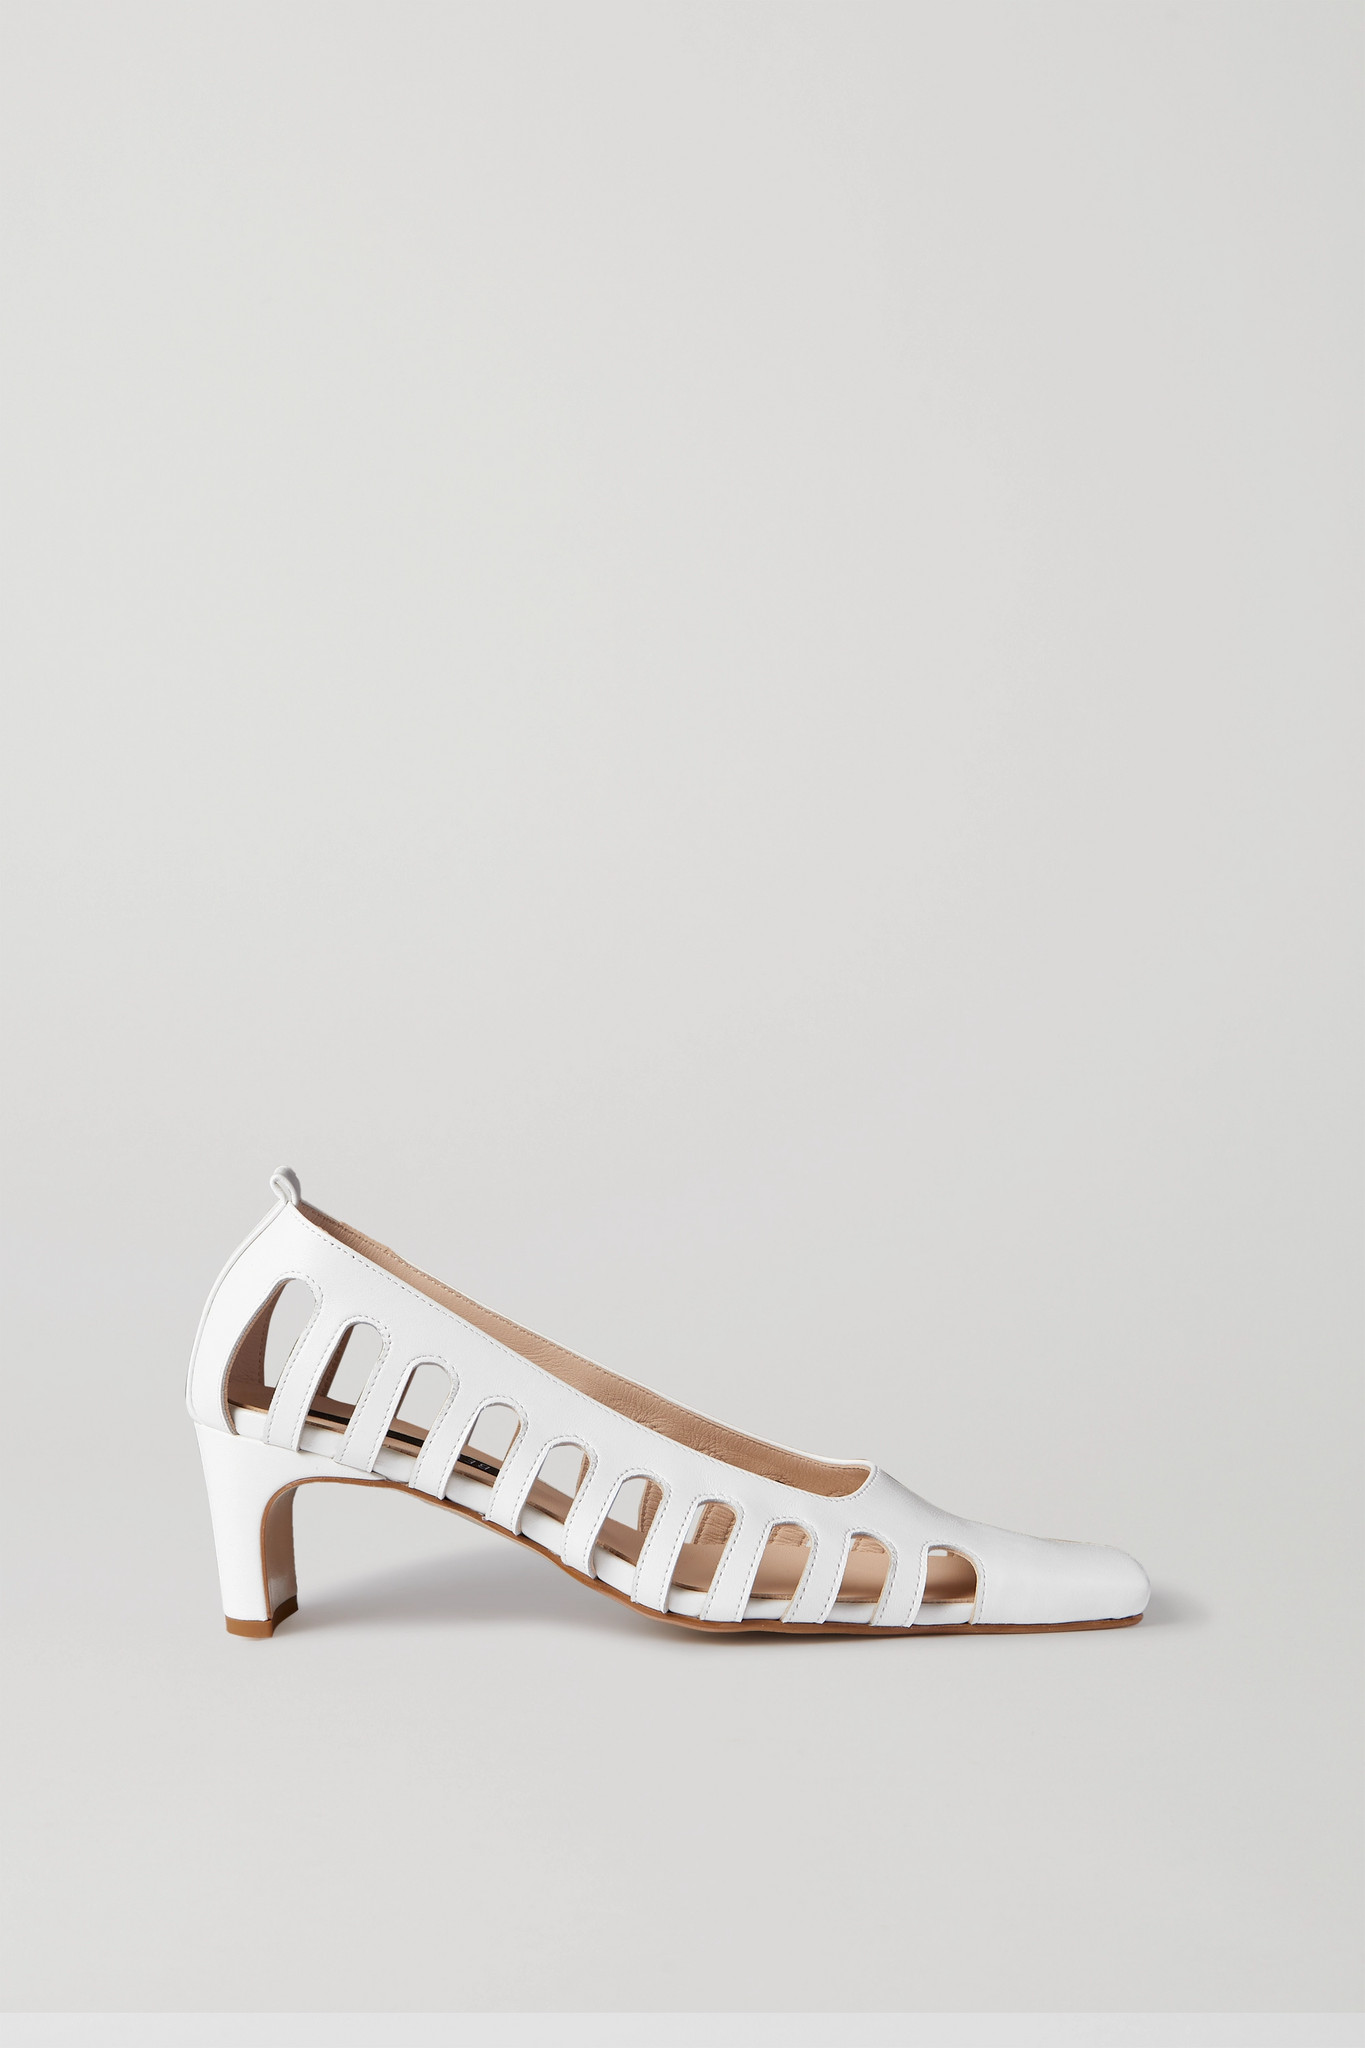 BEVZA - 挖剪皮革中跟鞋 - 白色 - IT40